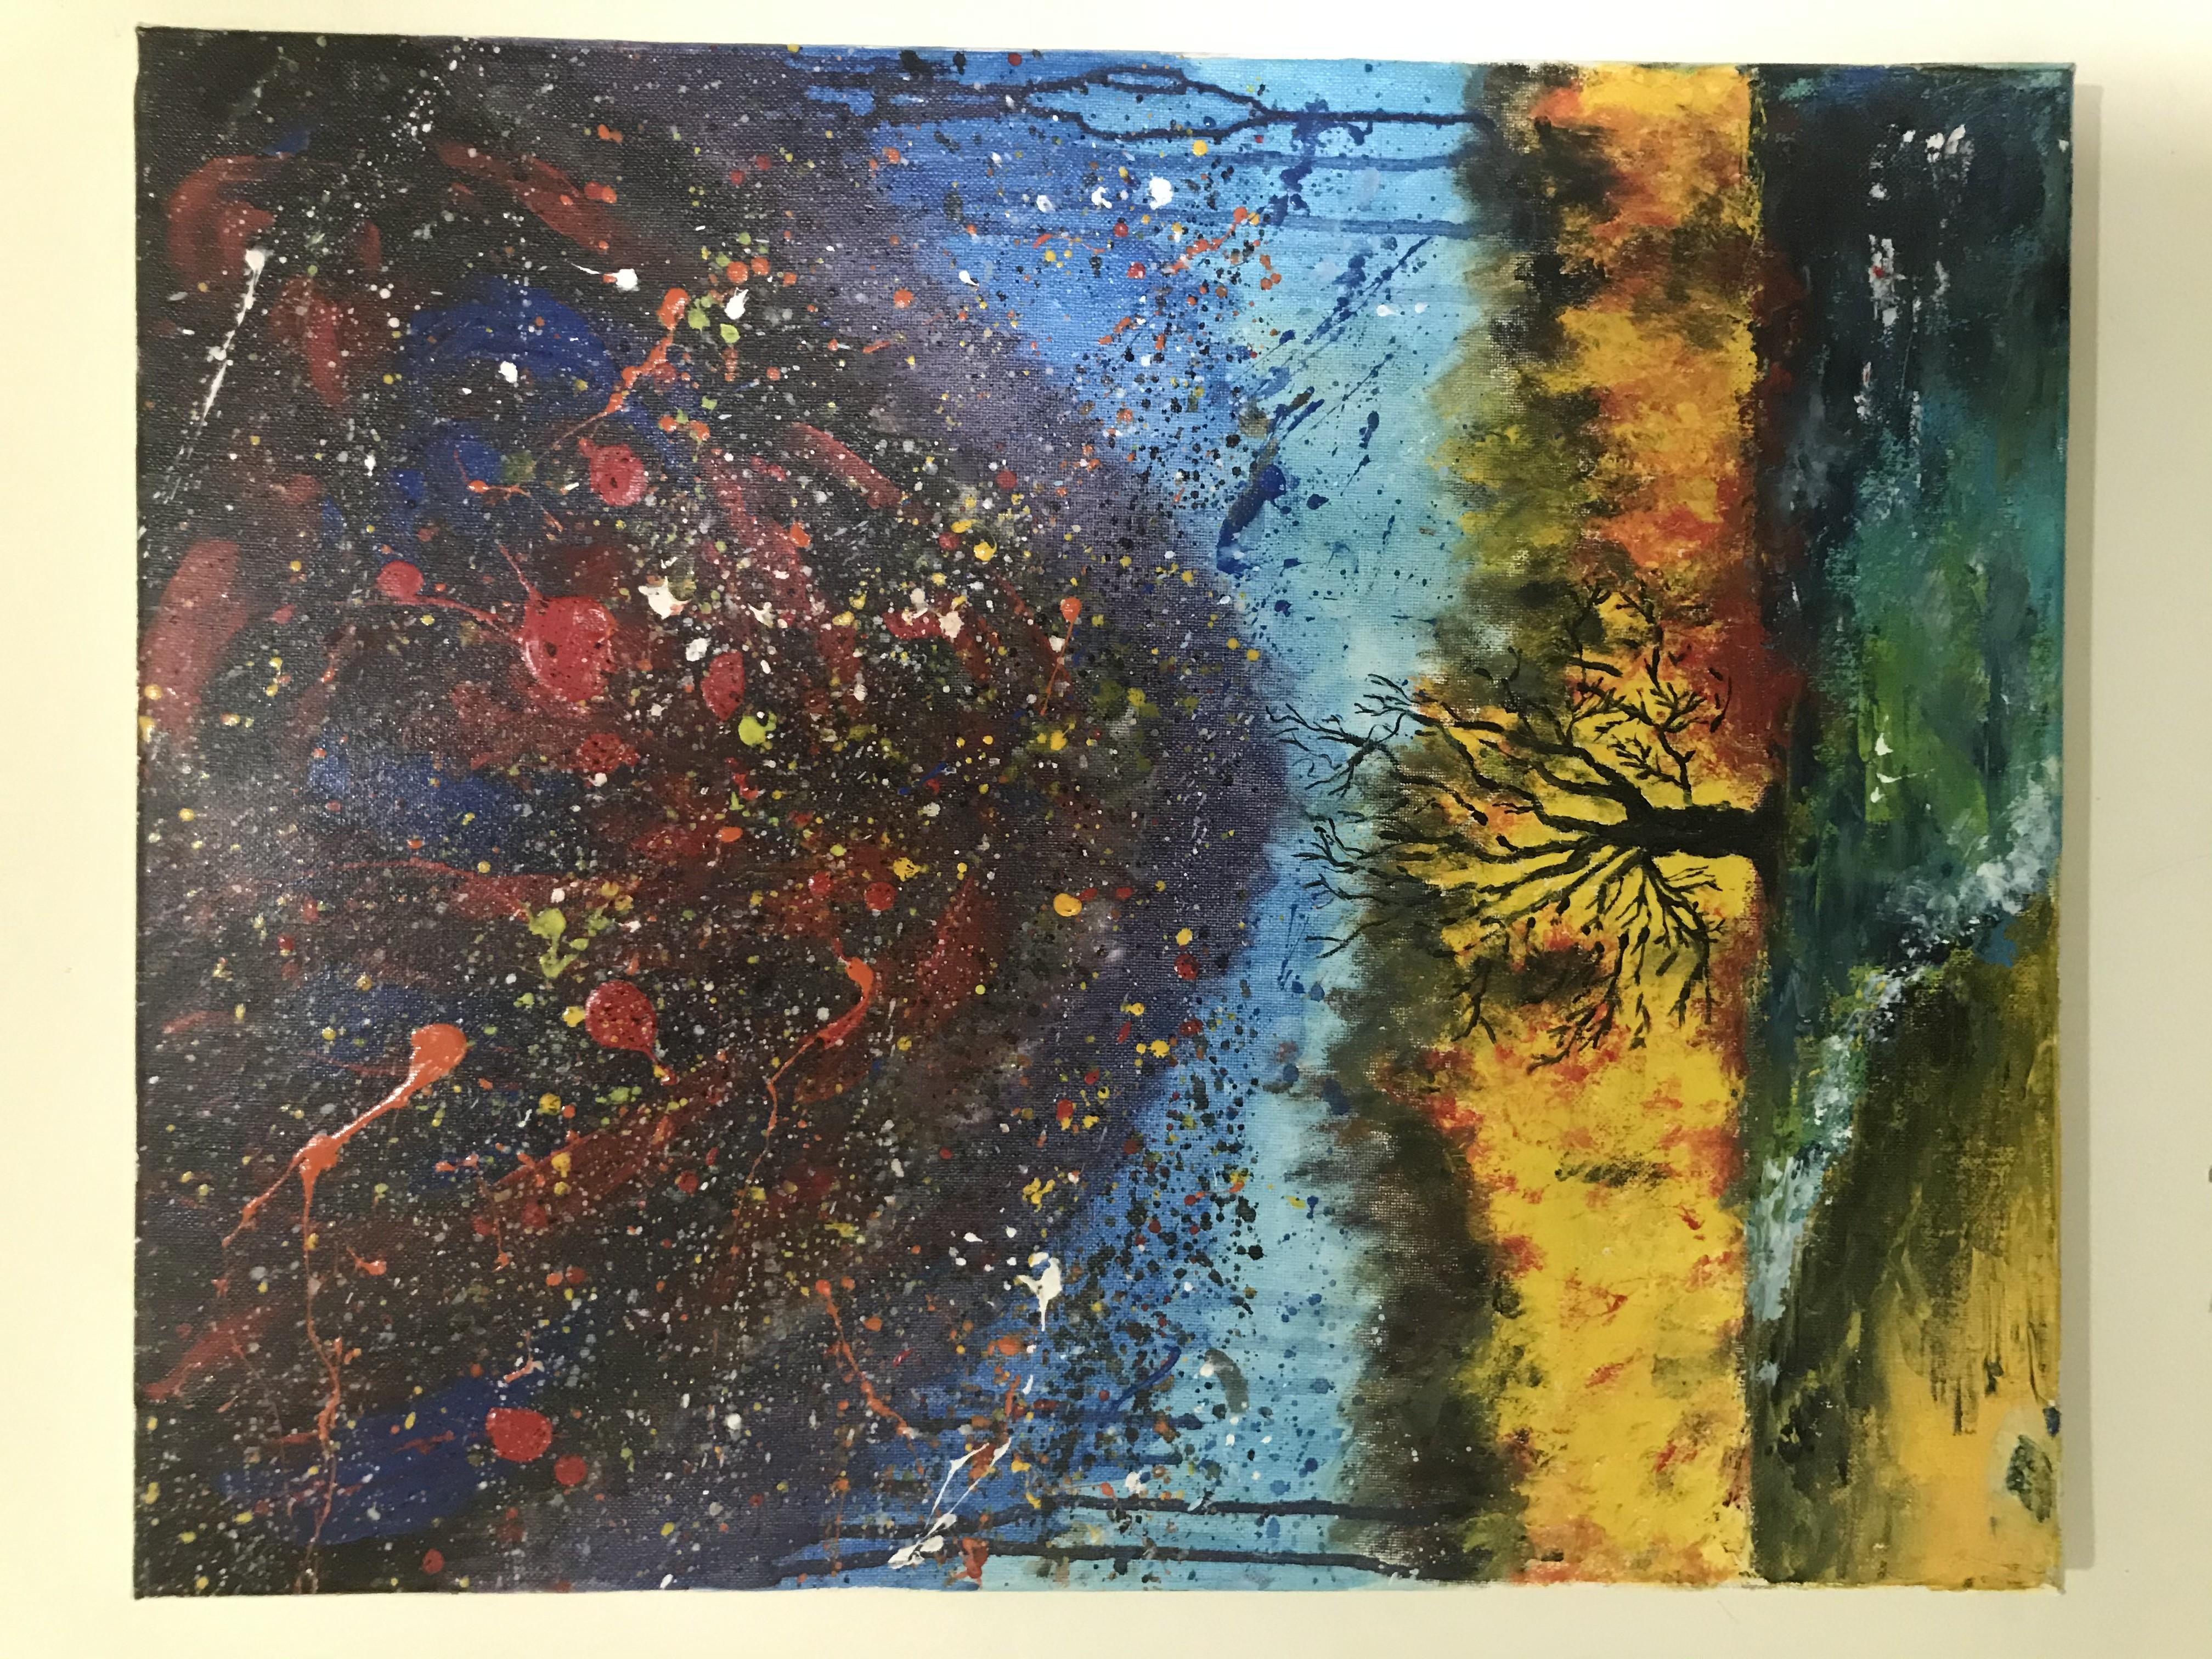 """Last Breath"" by Sanduni Bandara"